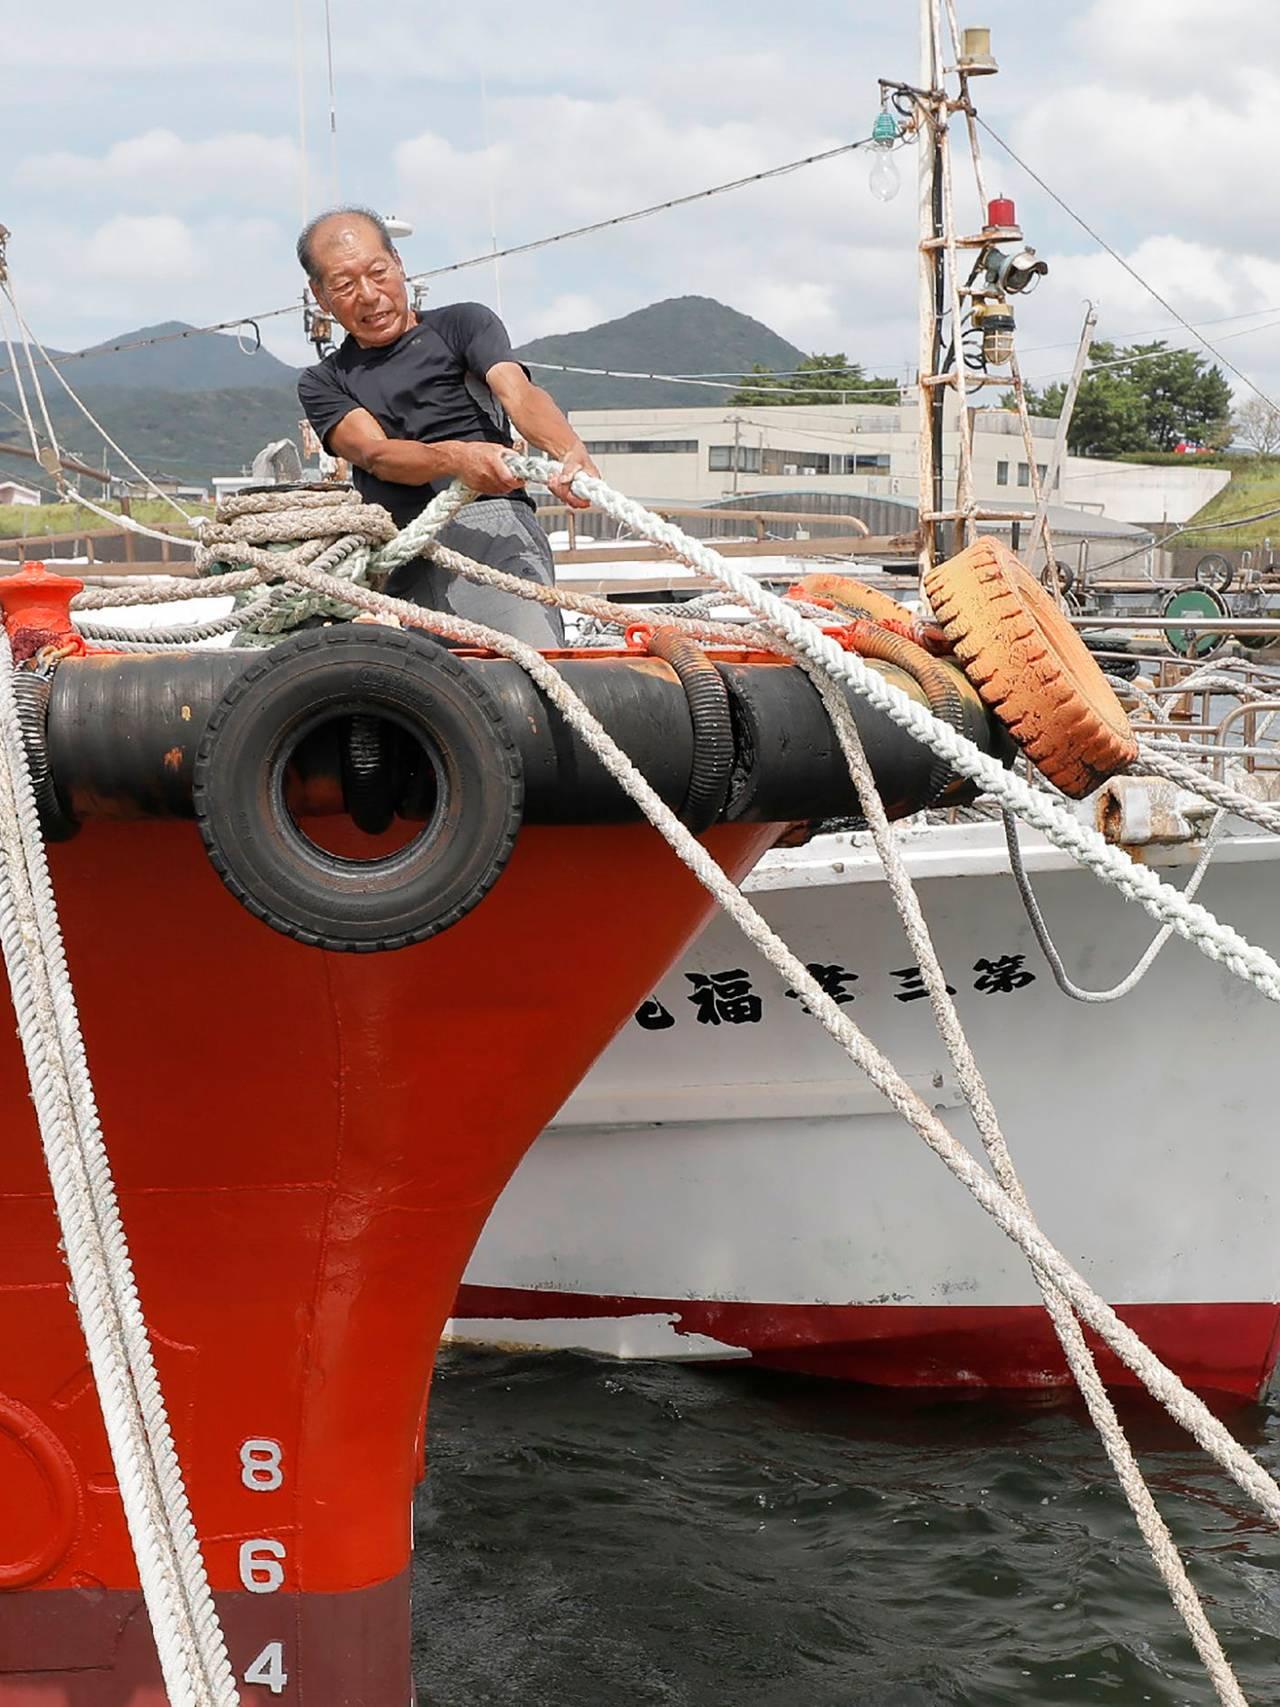 mann fester båten sin